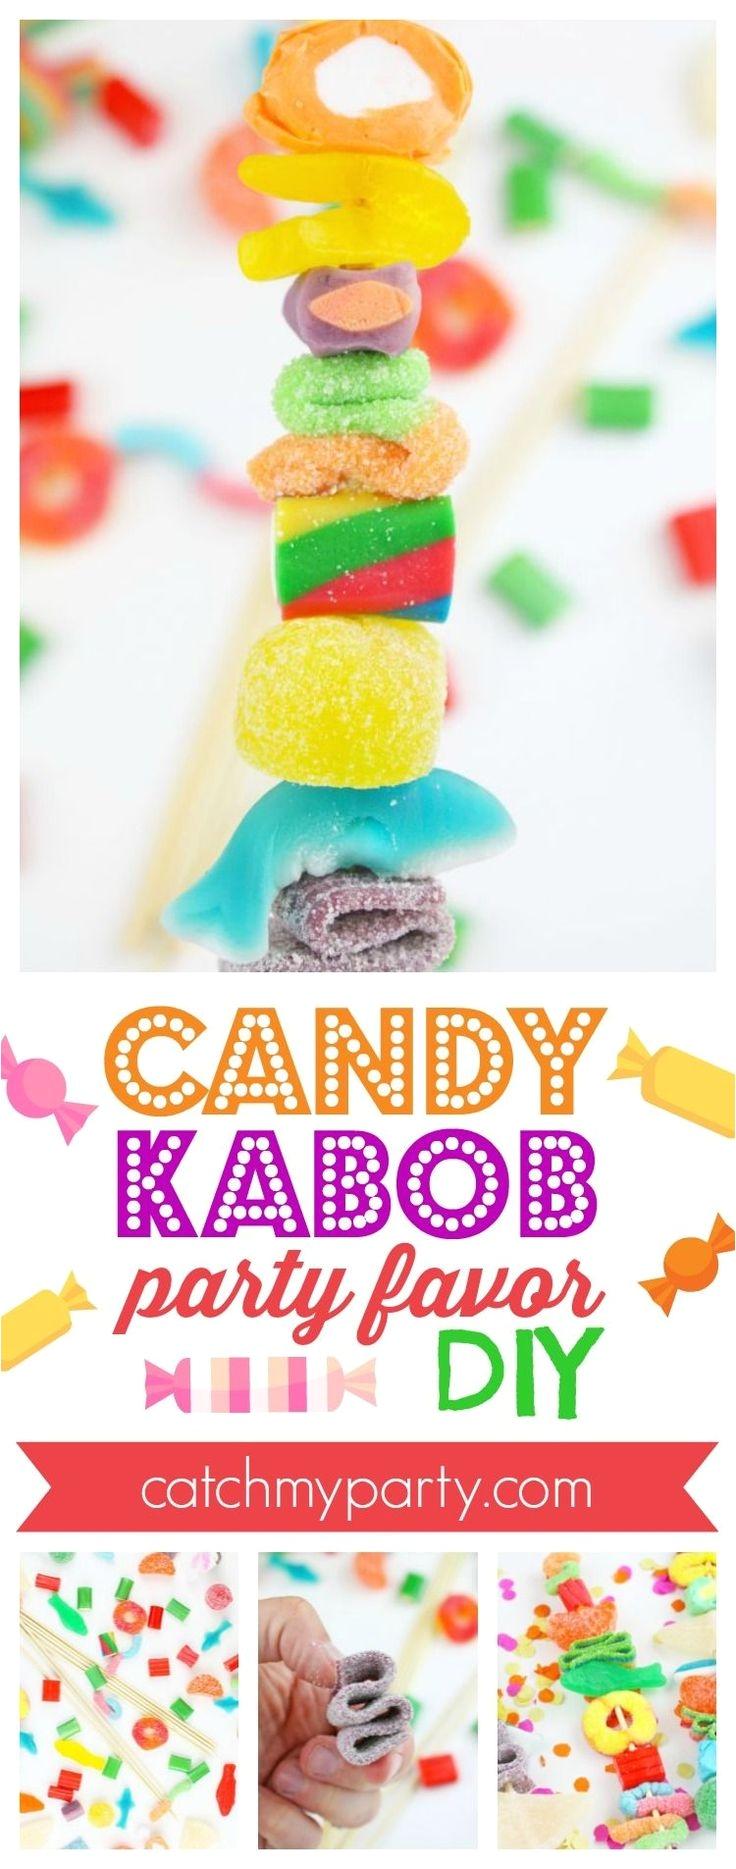 candy kabob party favor catchmyparty com catchmyparty partyfavor candy candybirthdayparty